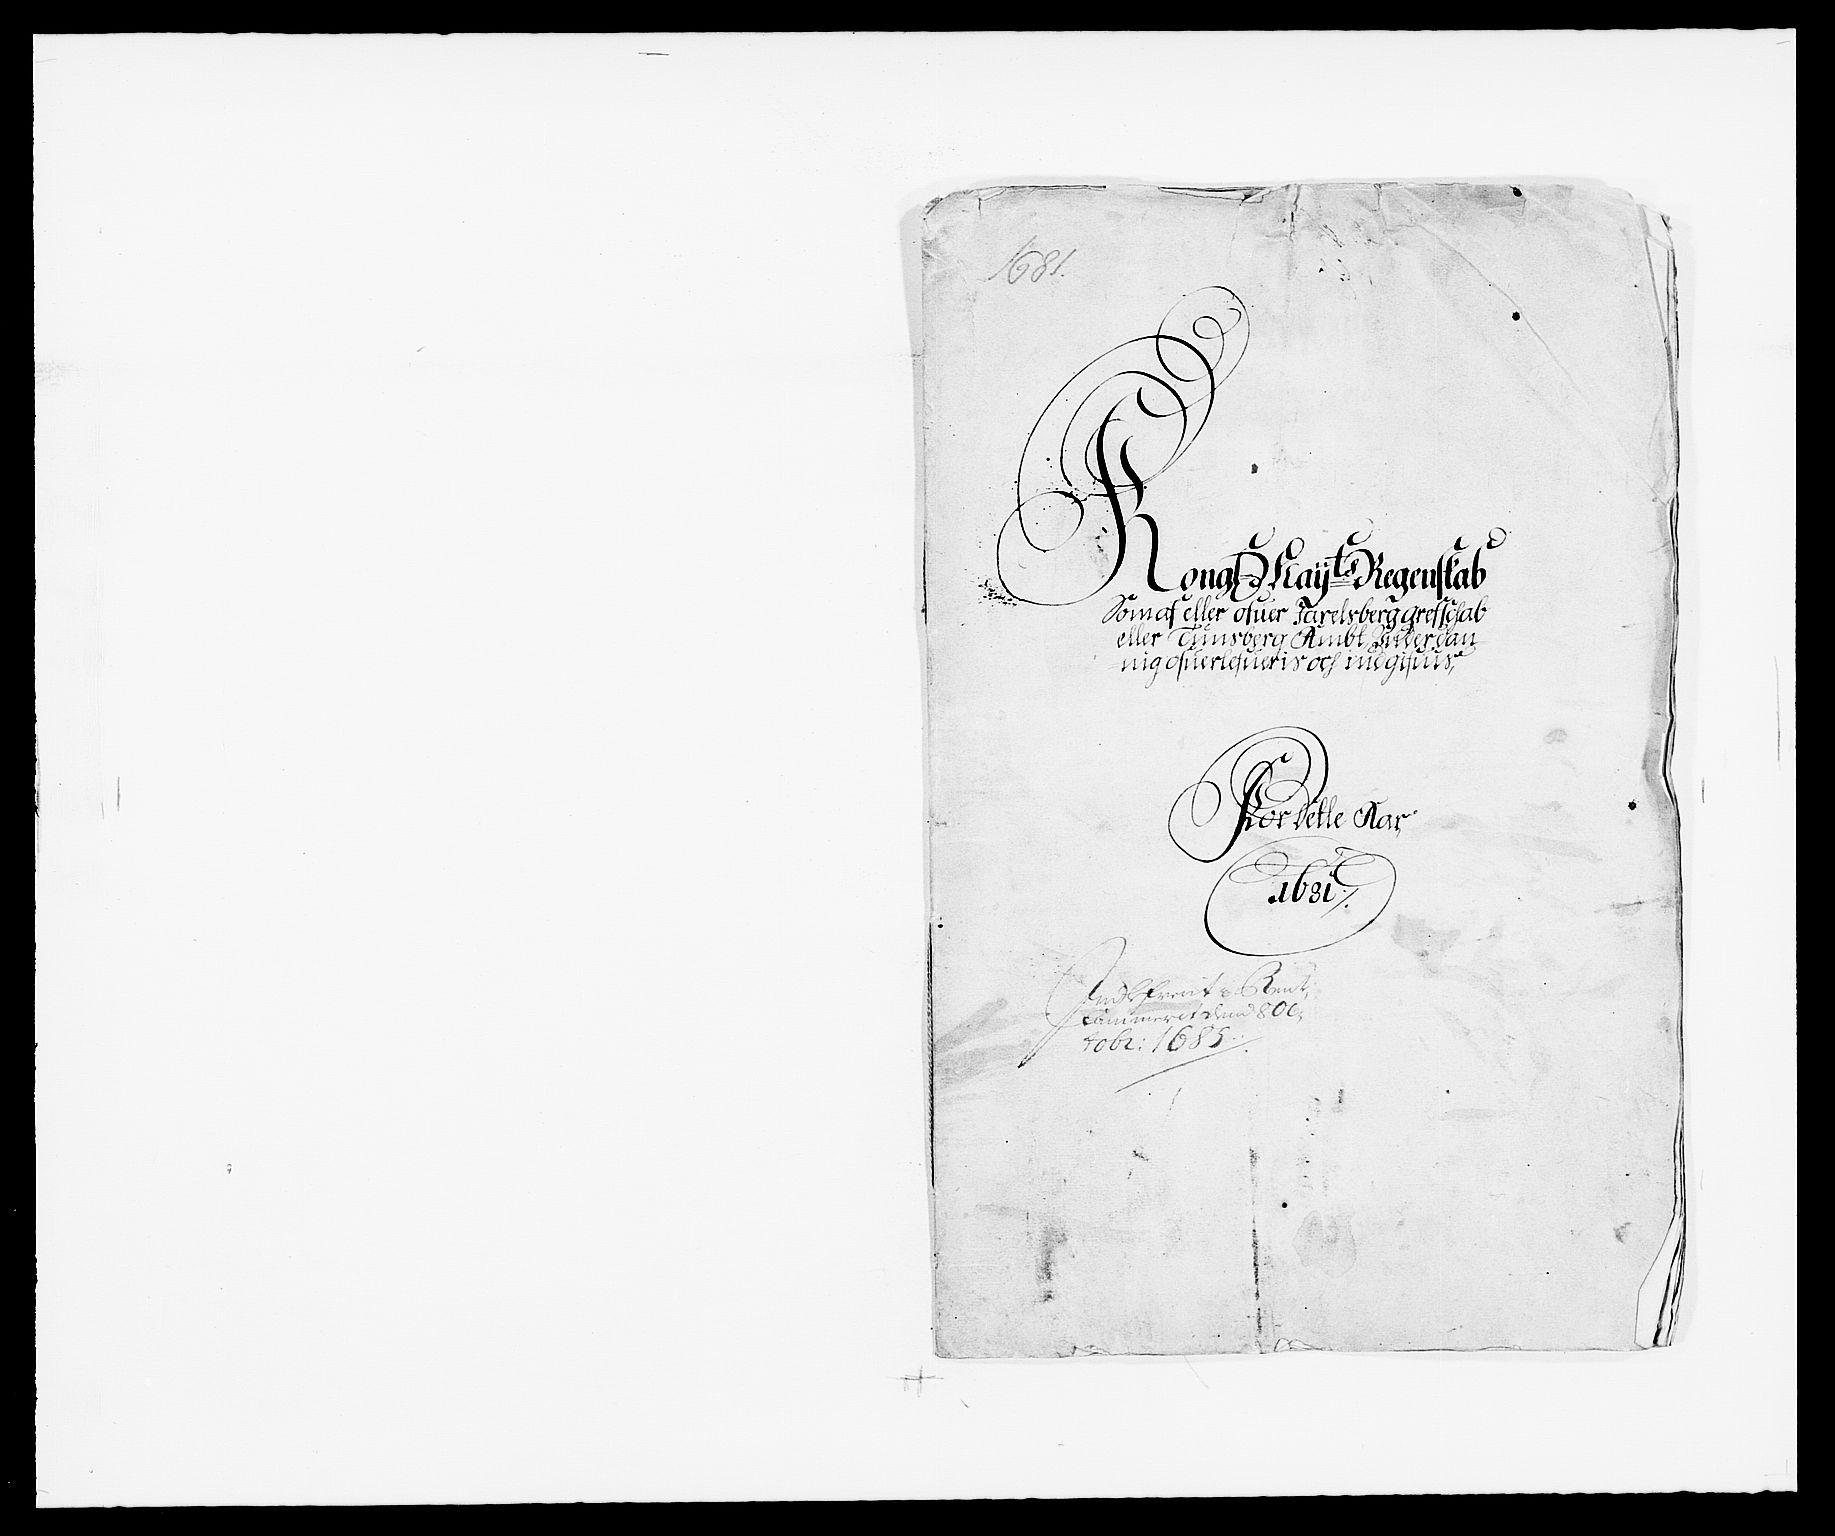 RA, Rentekammeret inntil 1814, Reviderte regnskaper, Fogderegnskap, R32/L1850: Fogderegnskap Jarlsberg grevskap, 1681, s. 1